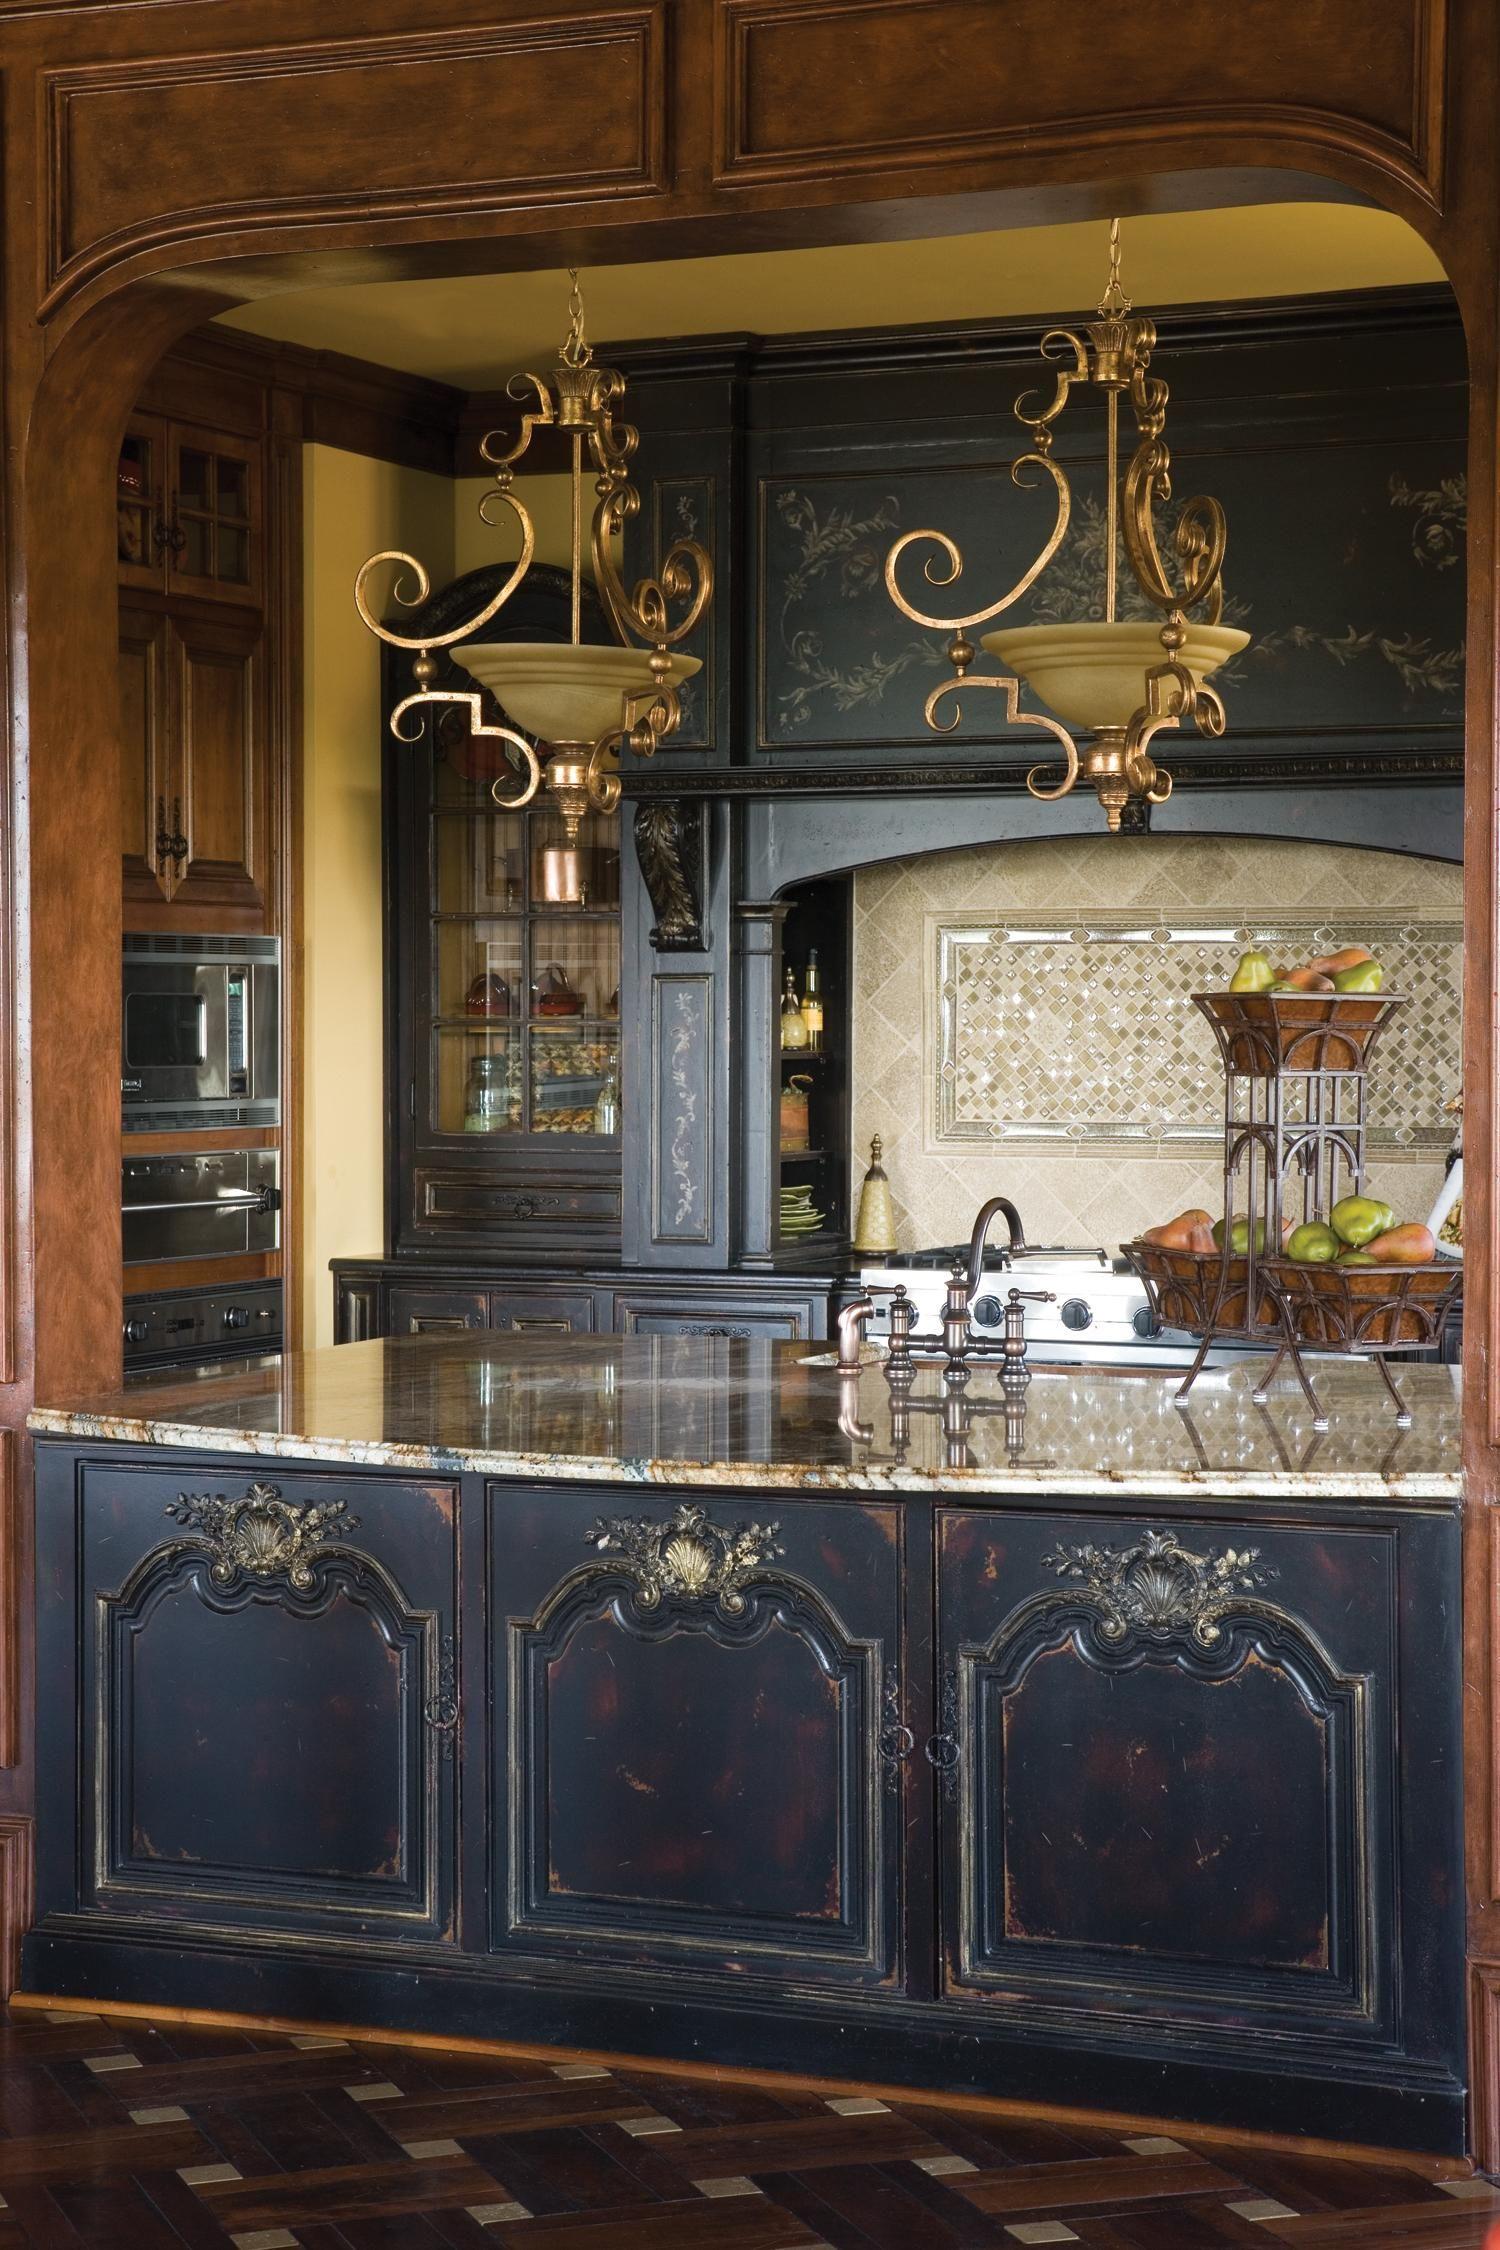 Best Kitchen Gallery: Beautiful Habersham Kitchens Habersham Custom Kitchen Cabi Ry of Kitchens Habersham Home on rachelxblog.com